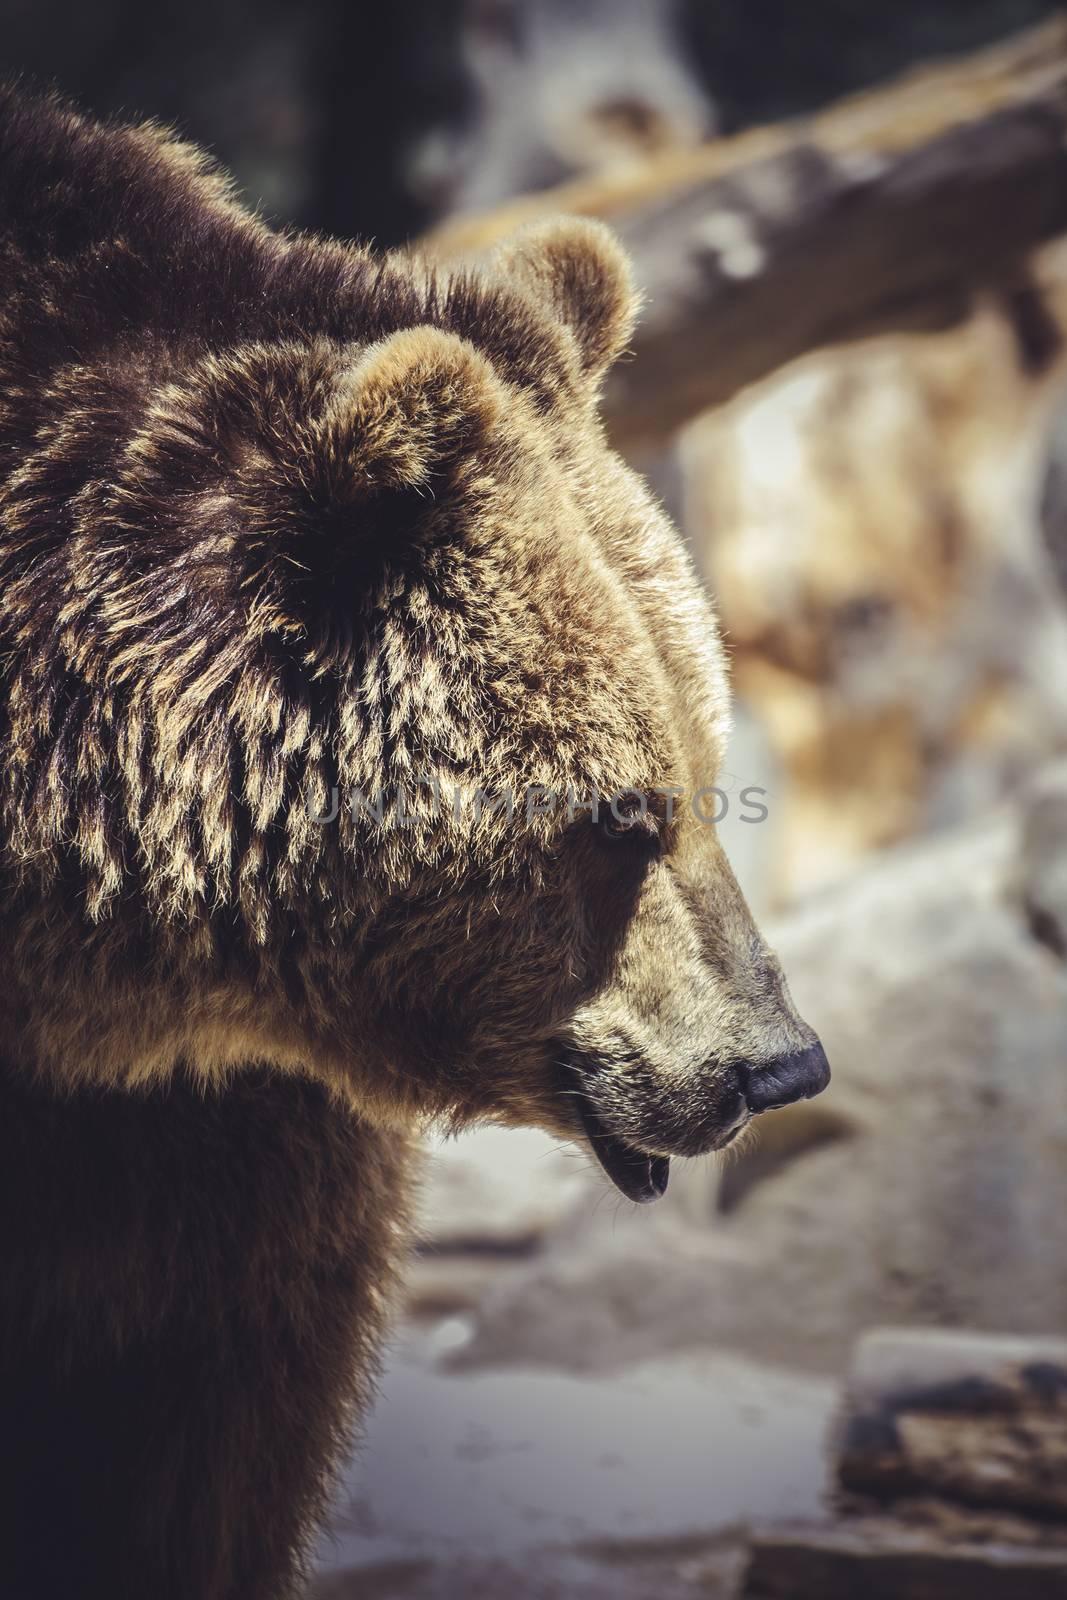 mammal, Spanish powerful brown bear, huge and strong  wild animal